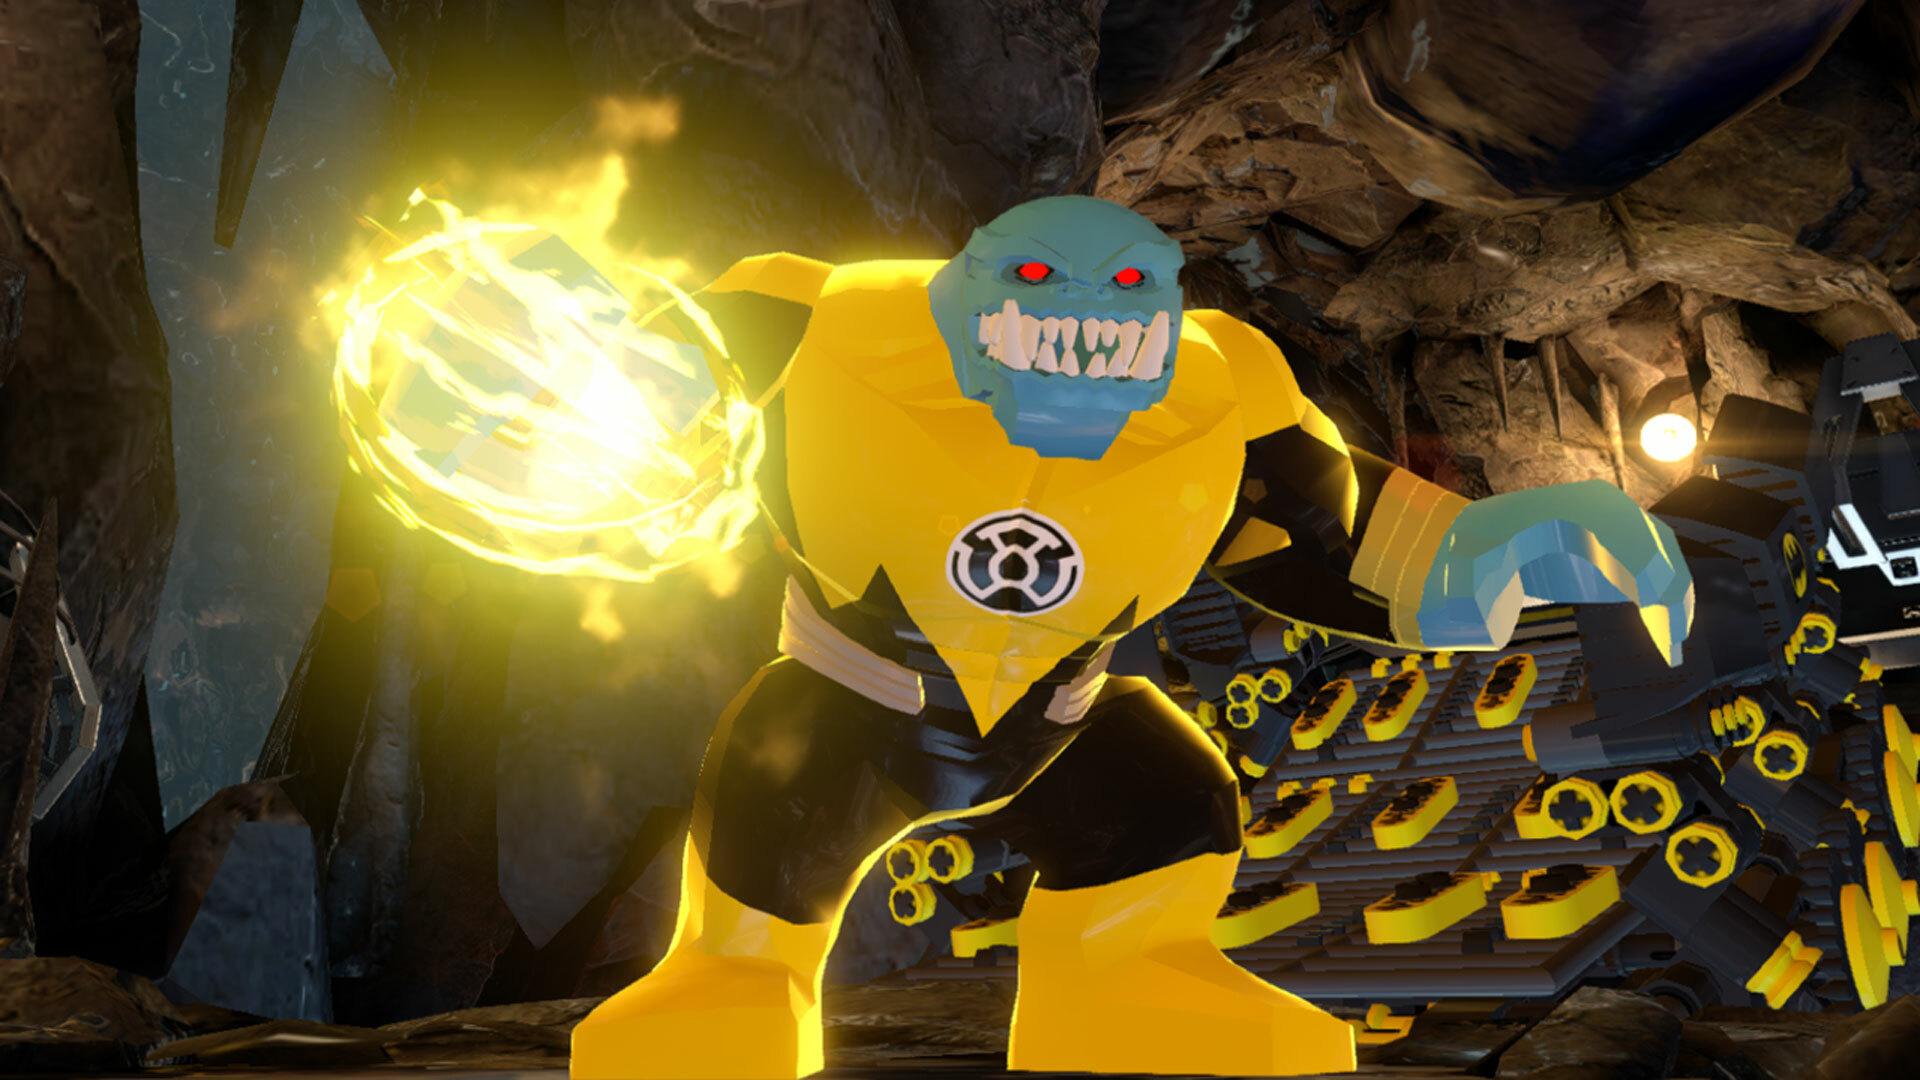 lego-batman-3-beyond-gotham-pc-screenshot-04